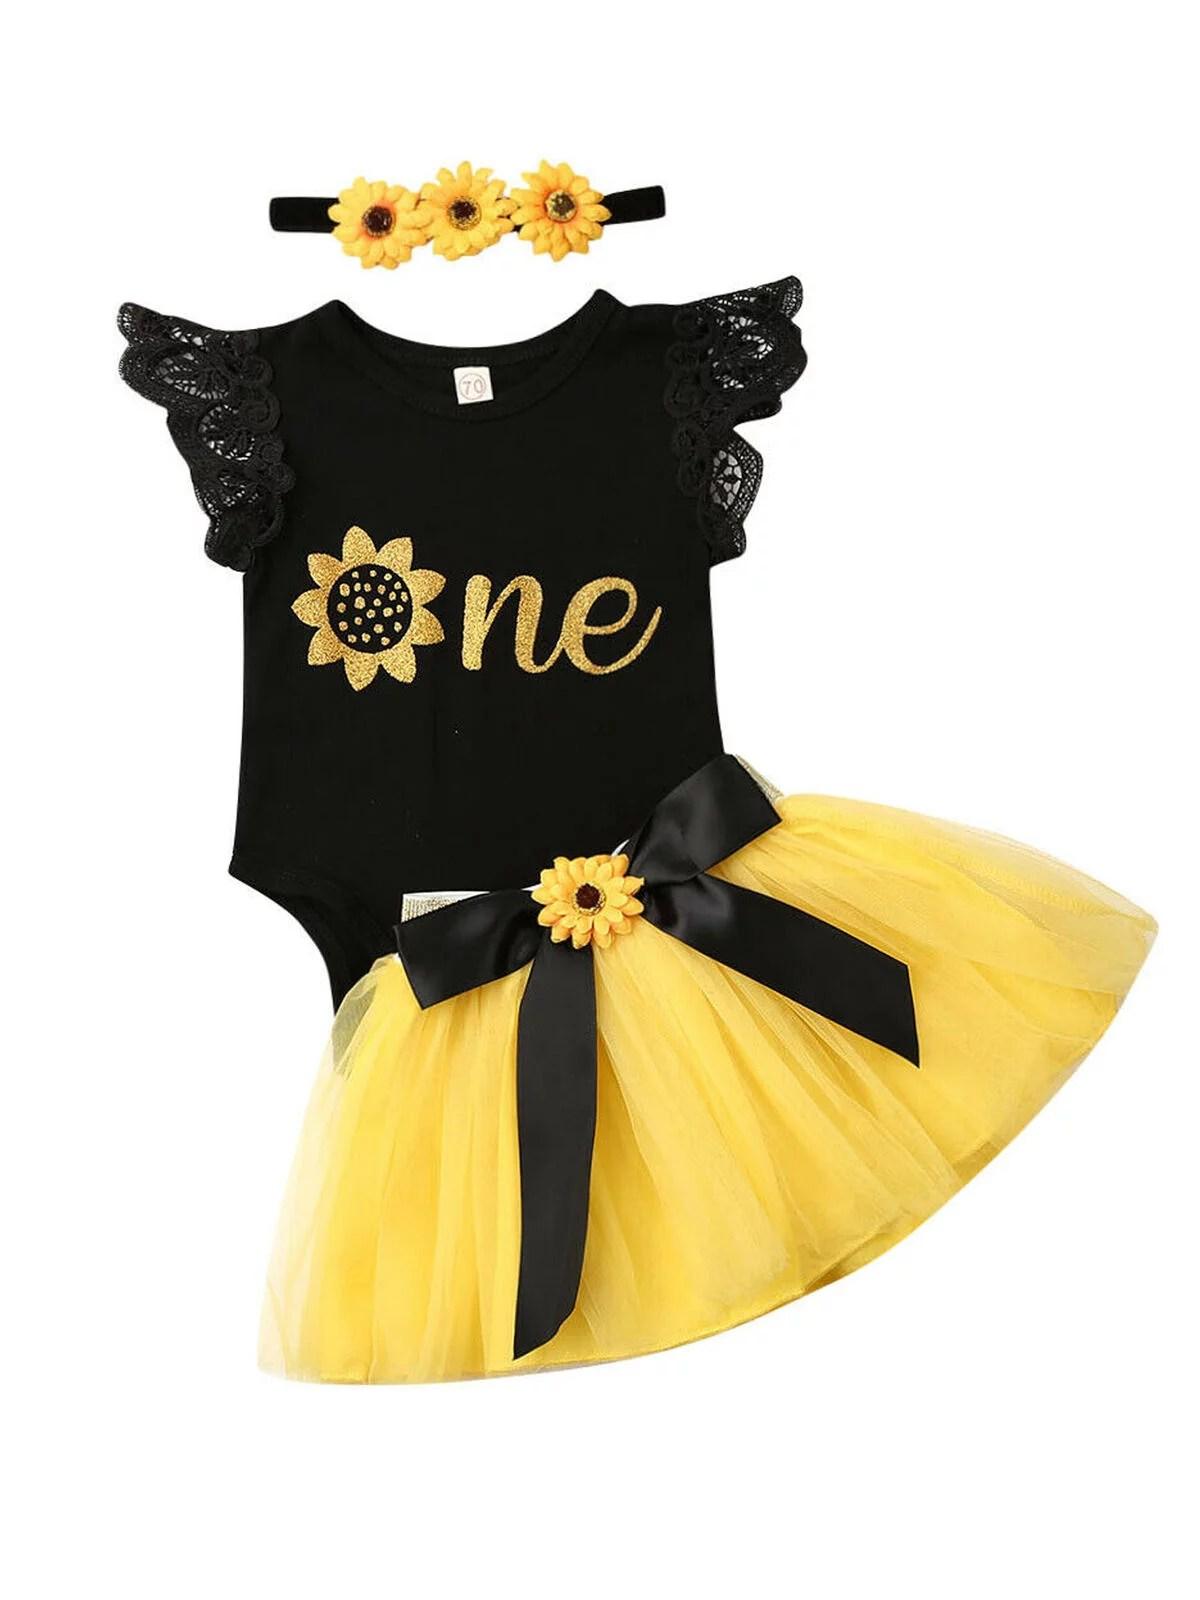 Multitrust Multitrust 3pcs Baby Girl 1st Birthday Outfit Party Flower Romper Tutu Dress Set Walmart Com Walmart Com